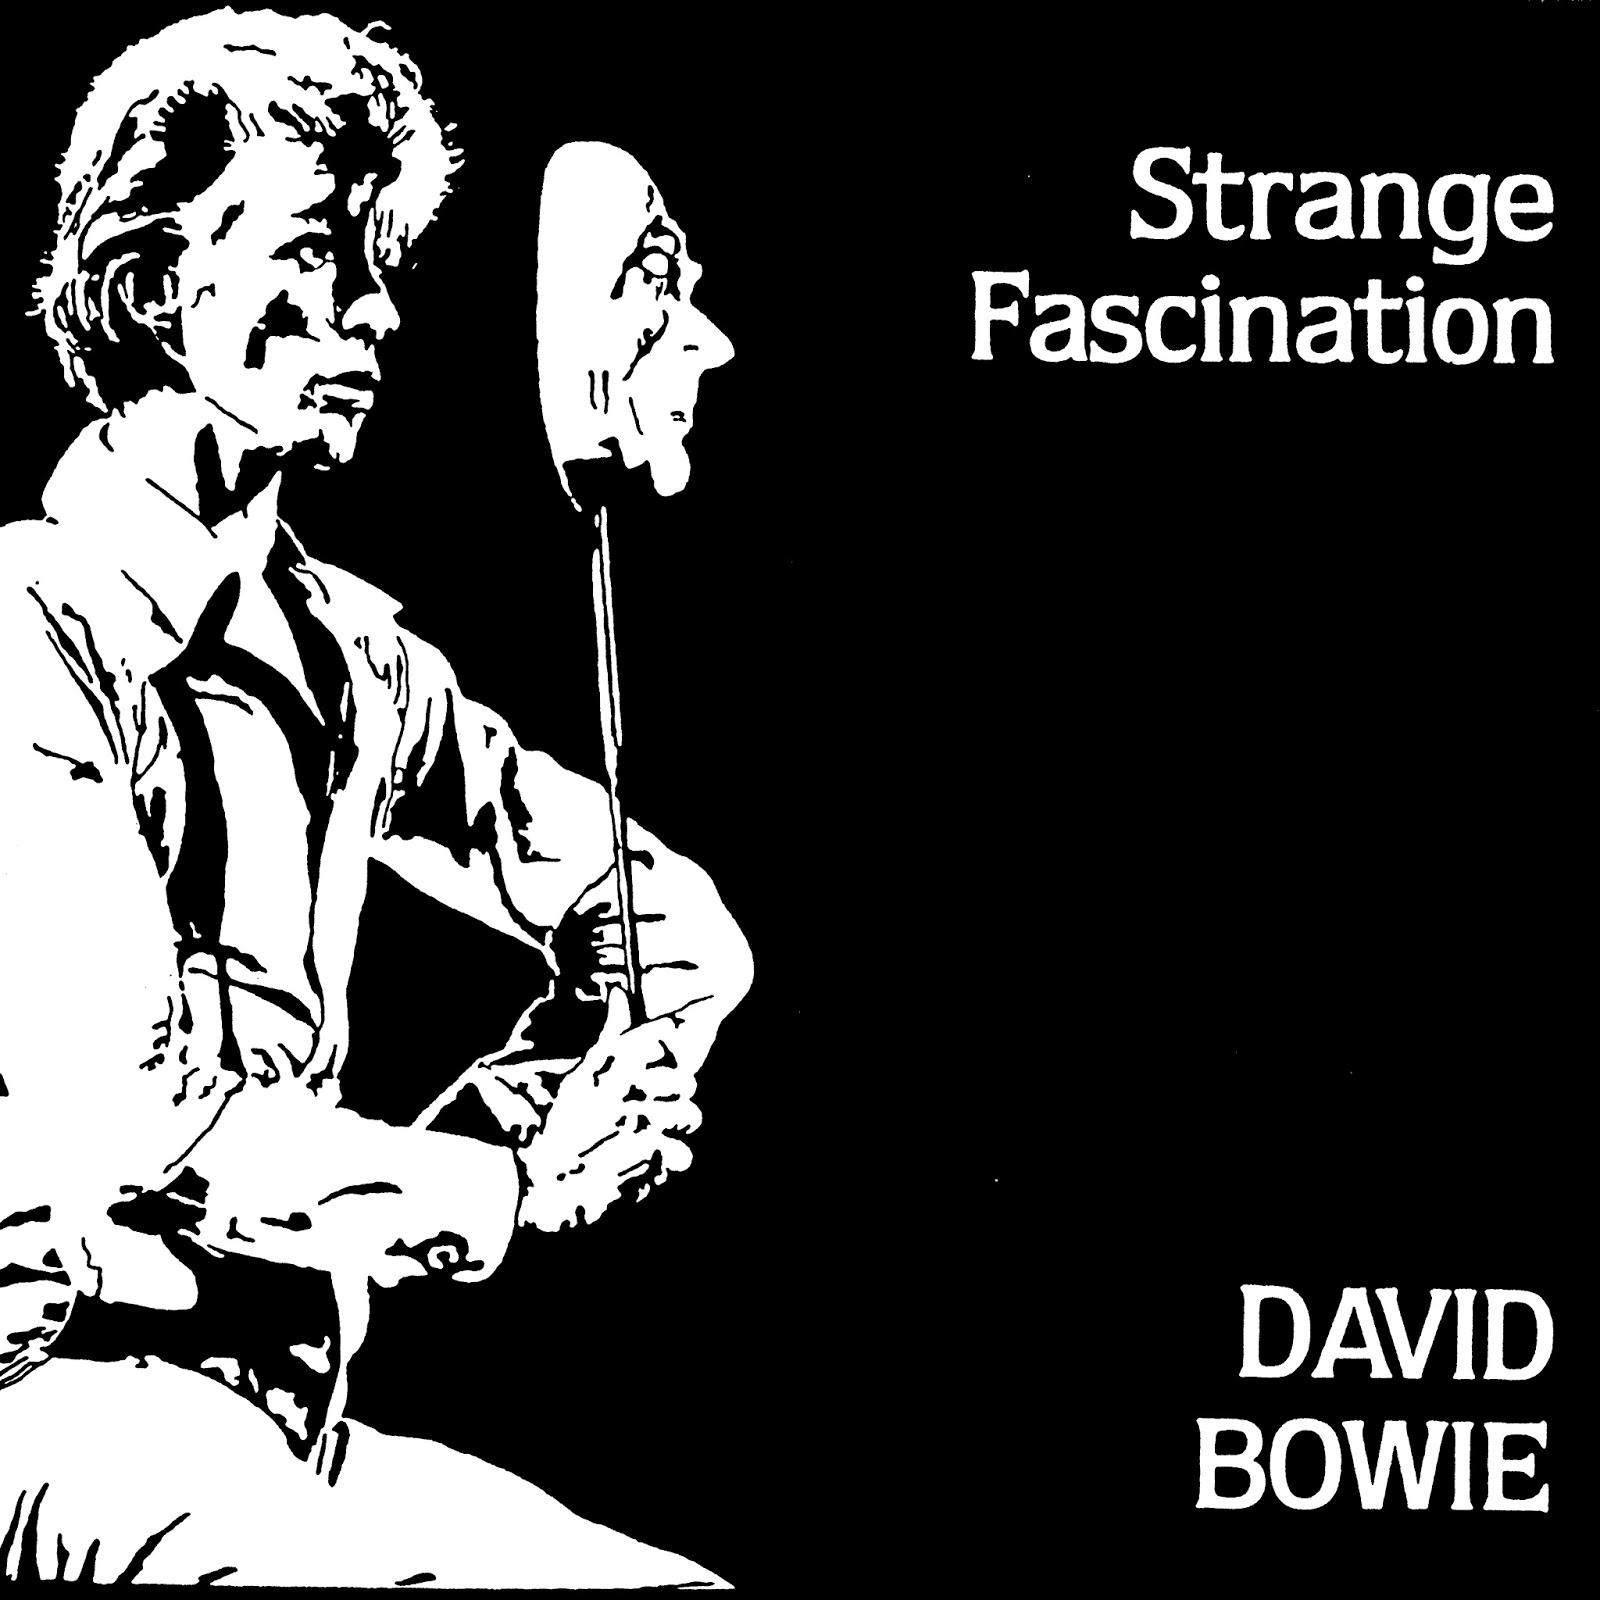 World Of BOOTLEGS BOOTLEG David Bowie Strange